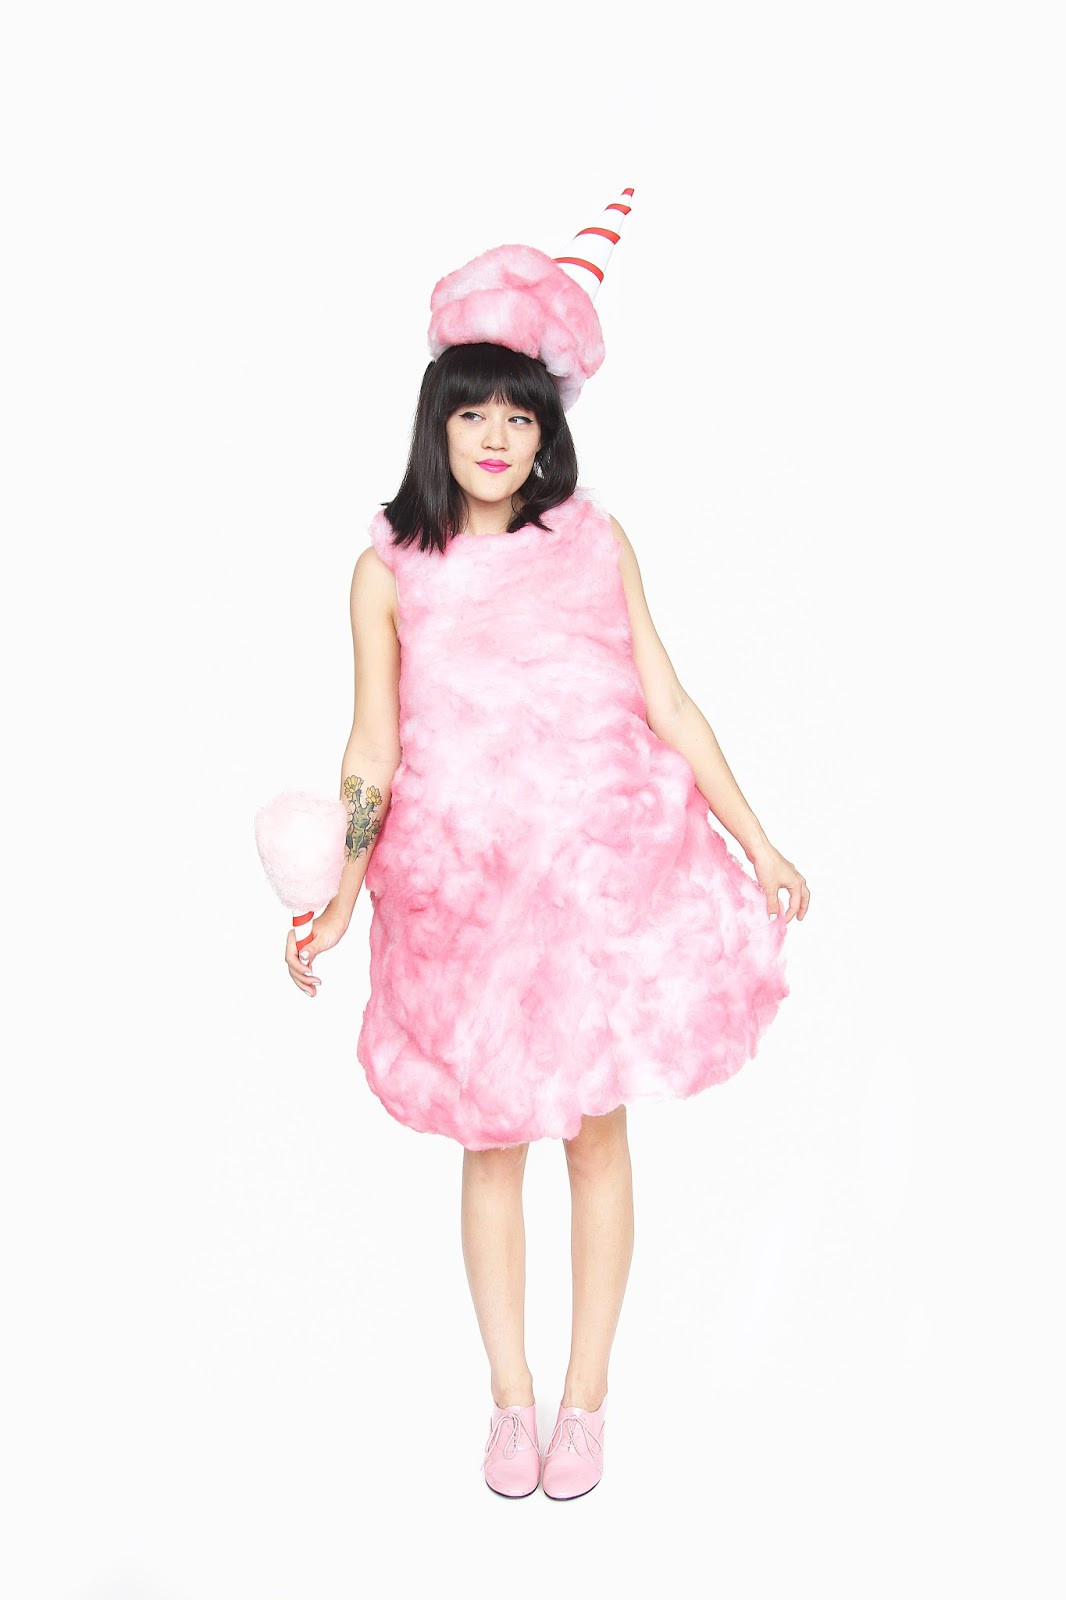 Candy Costumes DIY  Aww Sam DIY Cotton Candy Halloween Costume